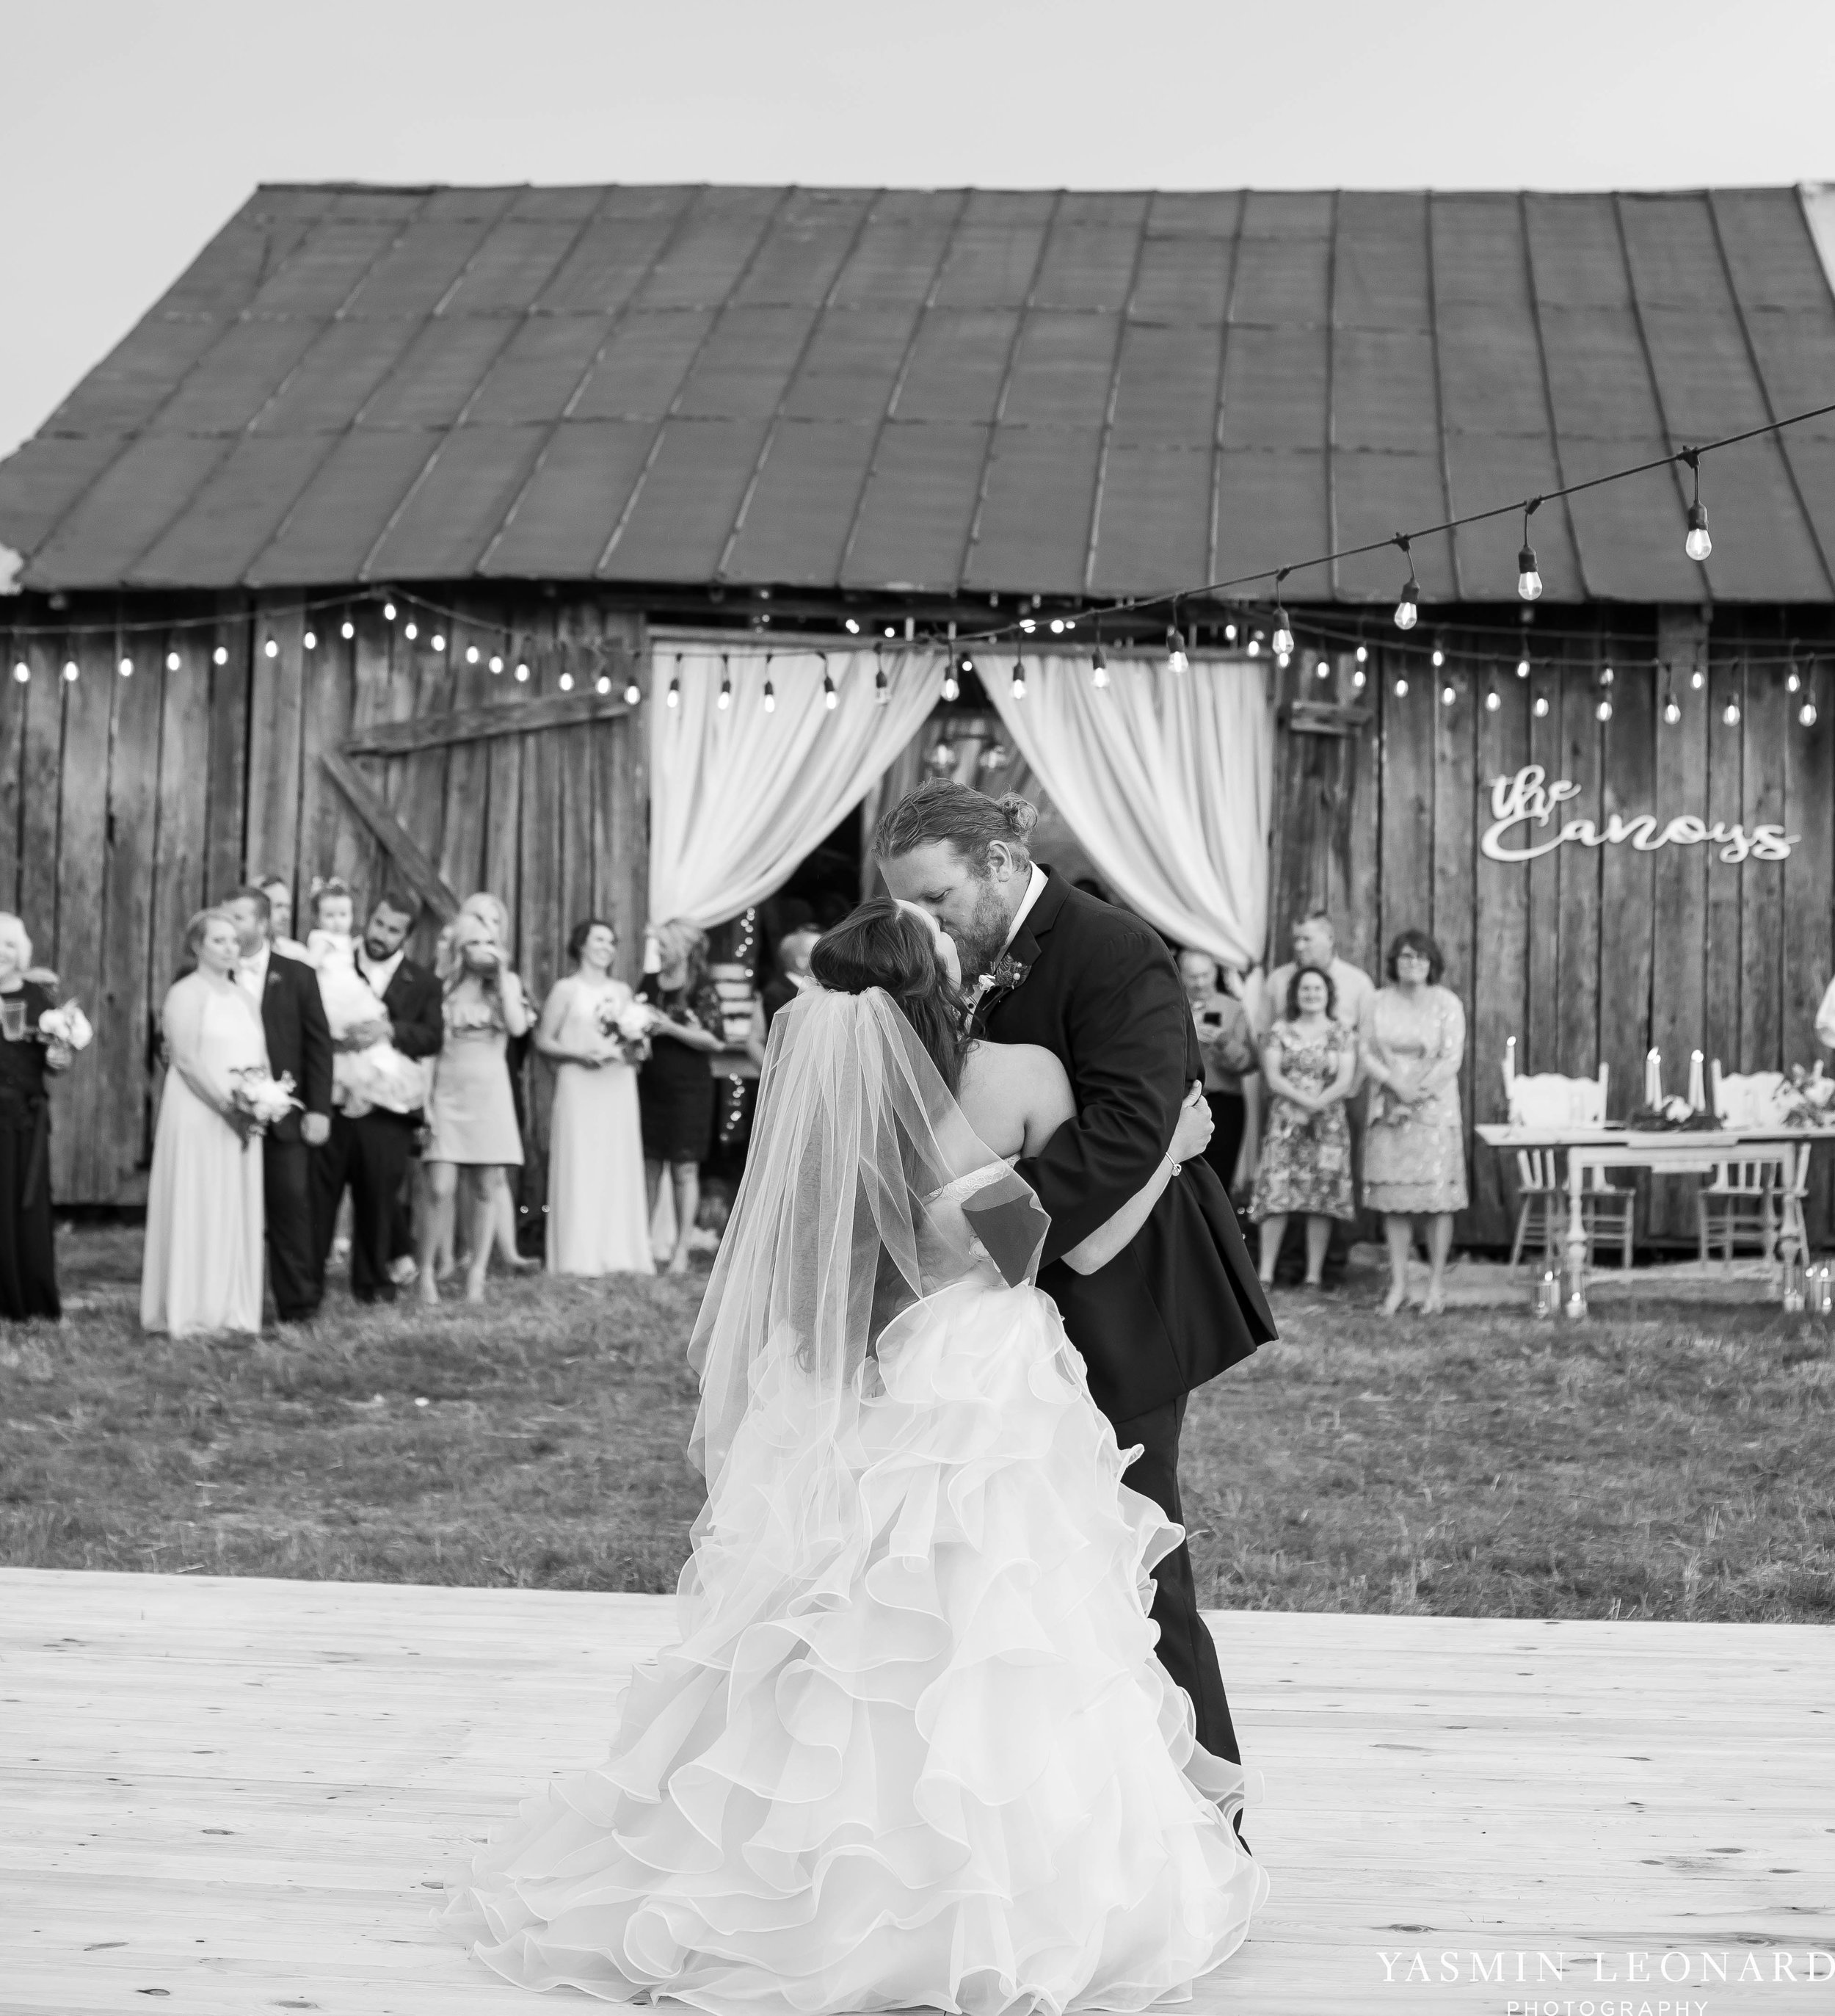 Rain on your wedding day - Rainy Wedding - Plan B for Rain - What to do if it rains on your wedding day - Wedding Inspiration - Outdoor wedding ideas - Rainy Wedding Pictures - Yasmin Leonard Photography-54.jpg